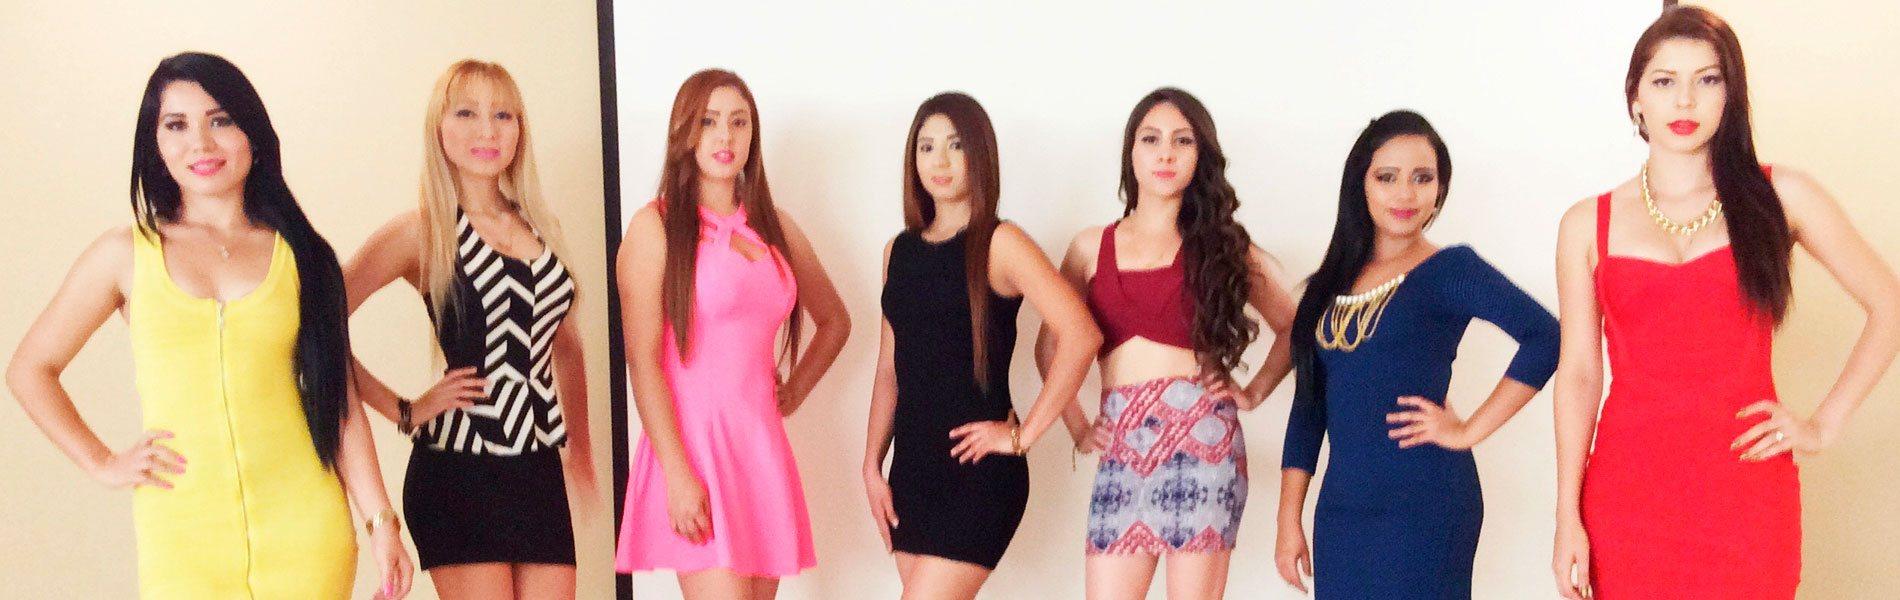 Casting para Anfitrionas y modelos